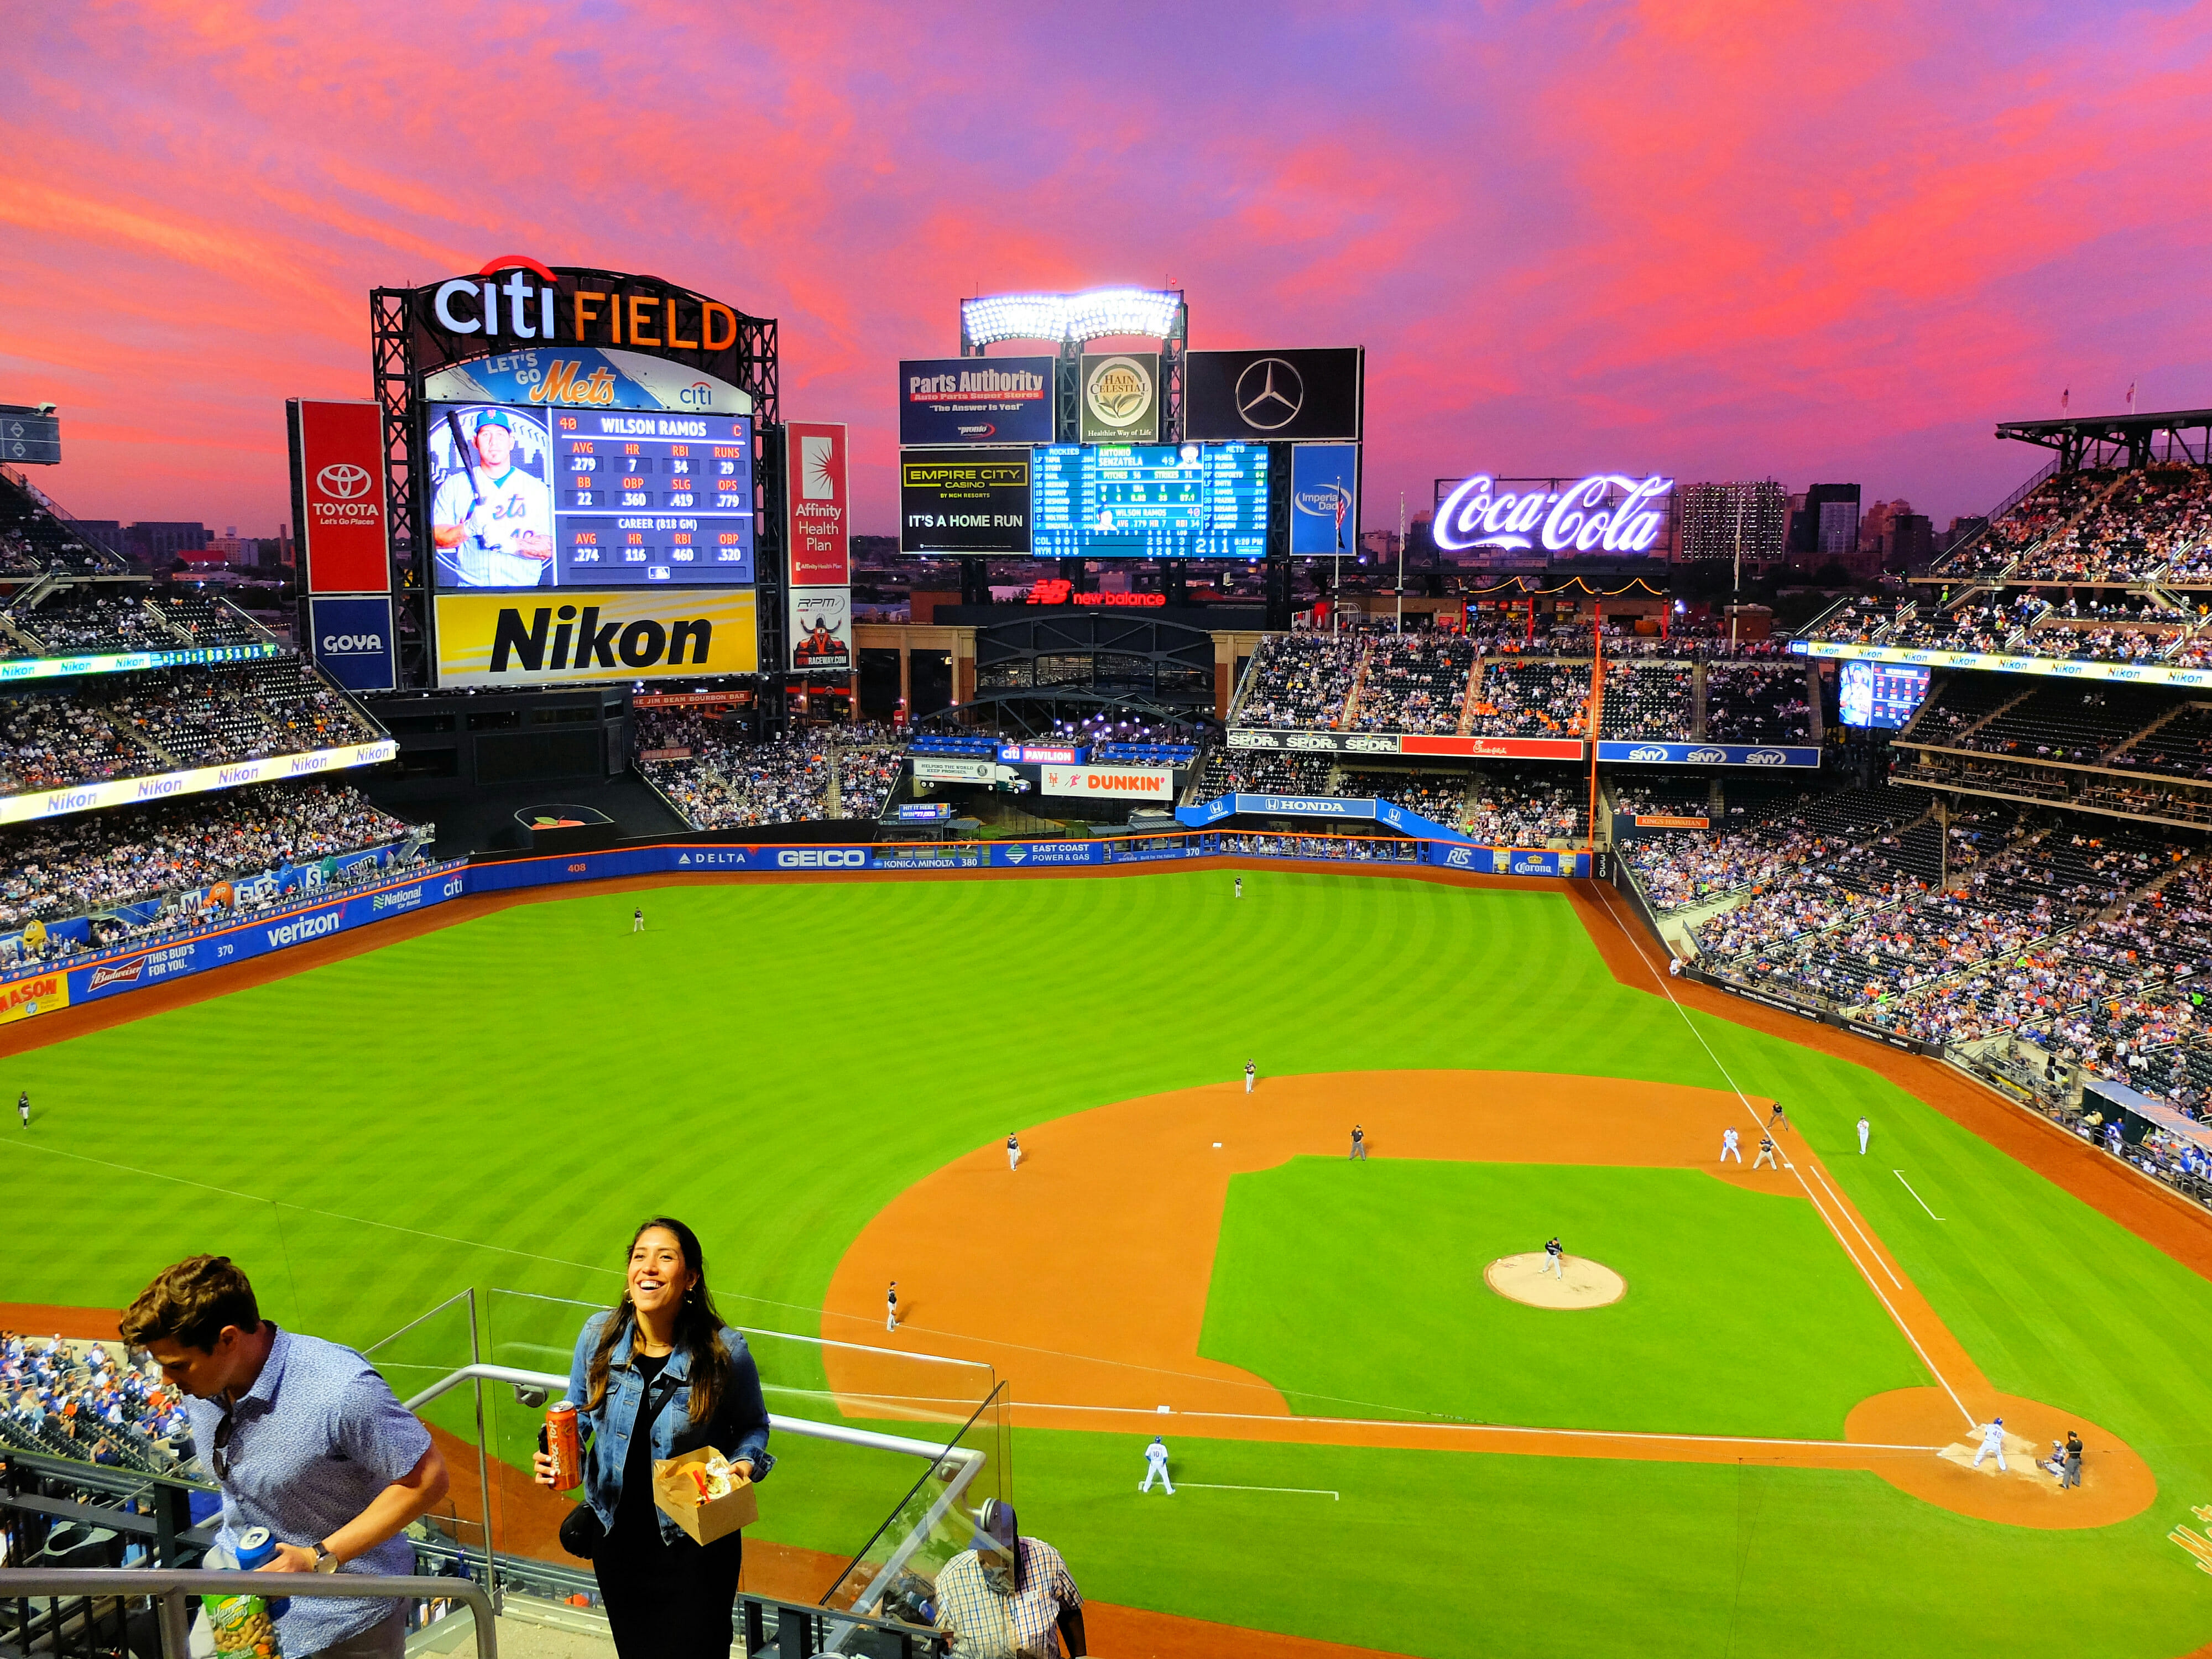 New York Mets Baseball Game at Sunset High Quality Wallpaper